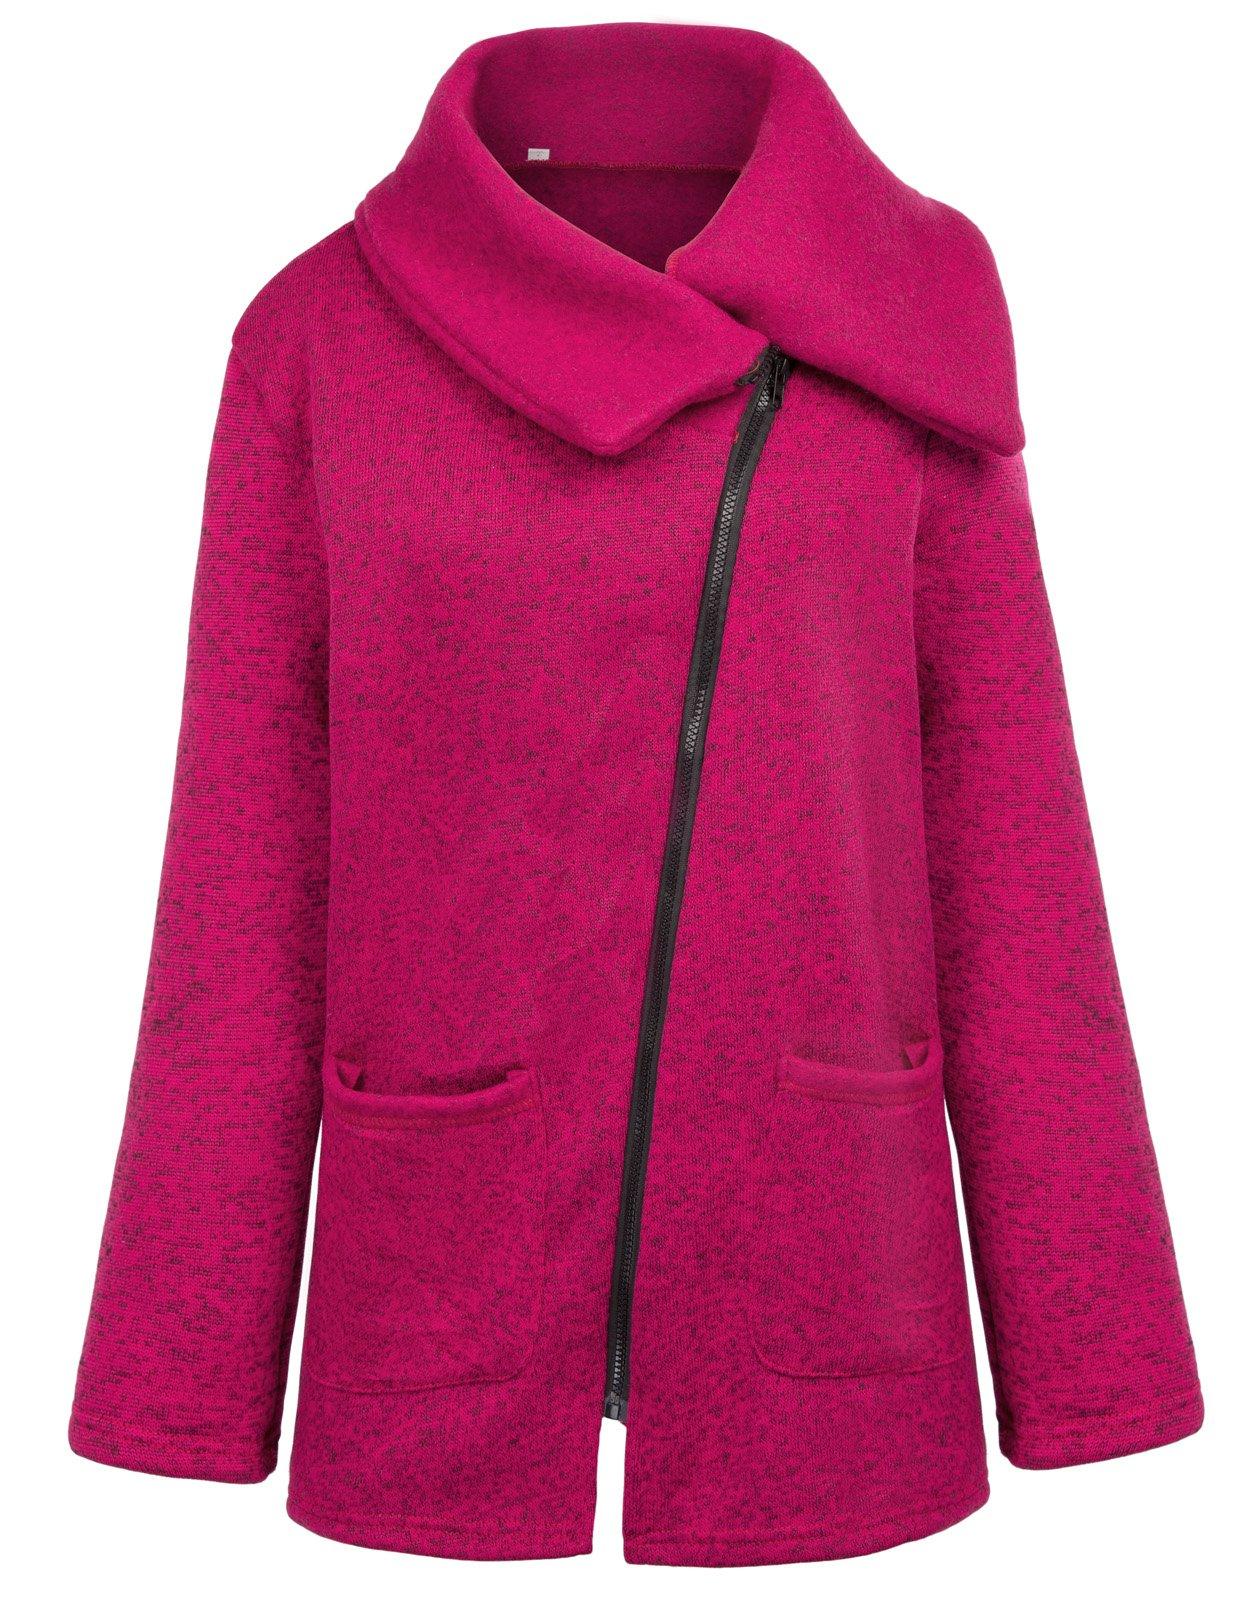 Grace Karin Fashion Women Soft Breathable Full Zip Fleece Coat XXL Burgundy